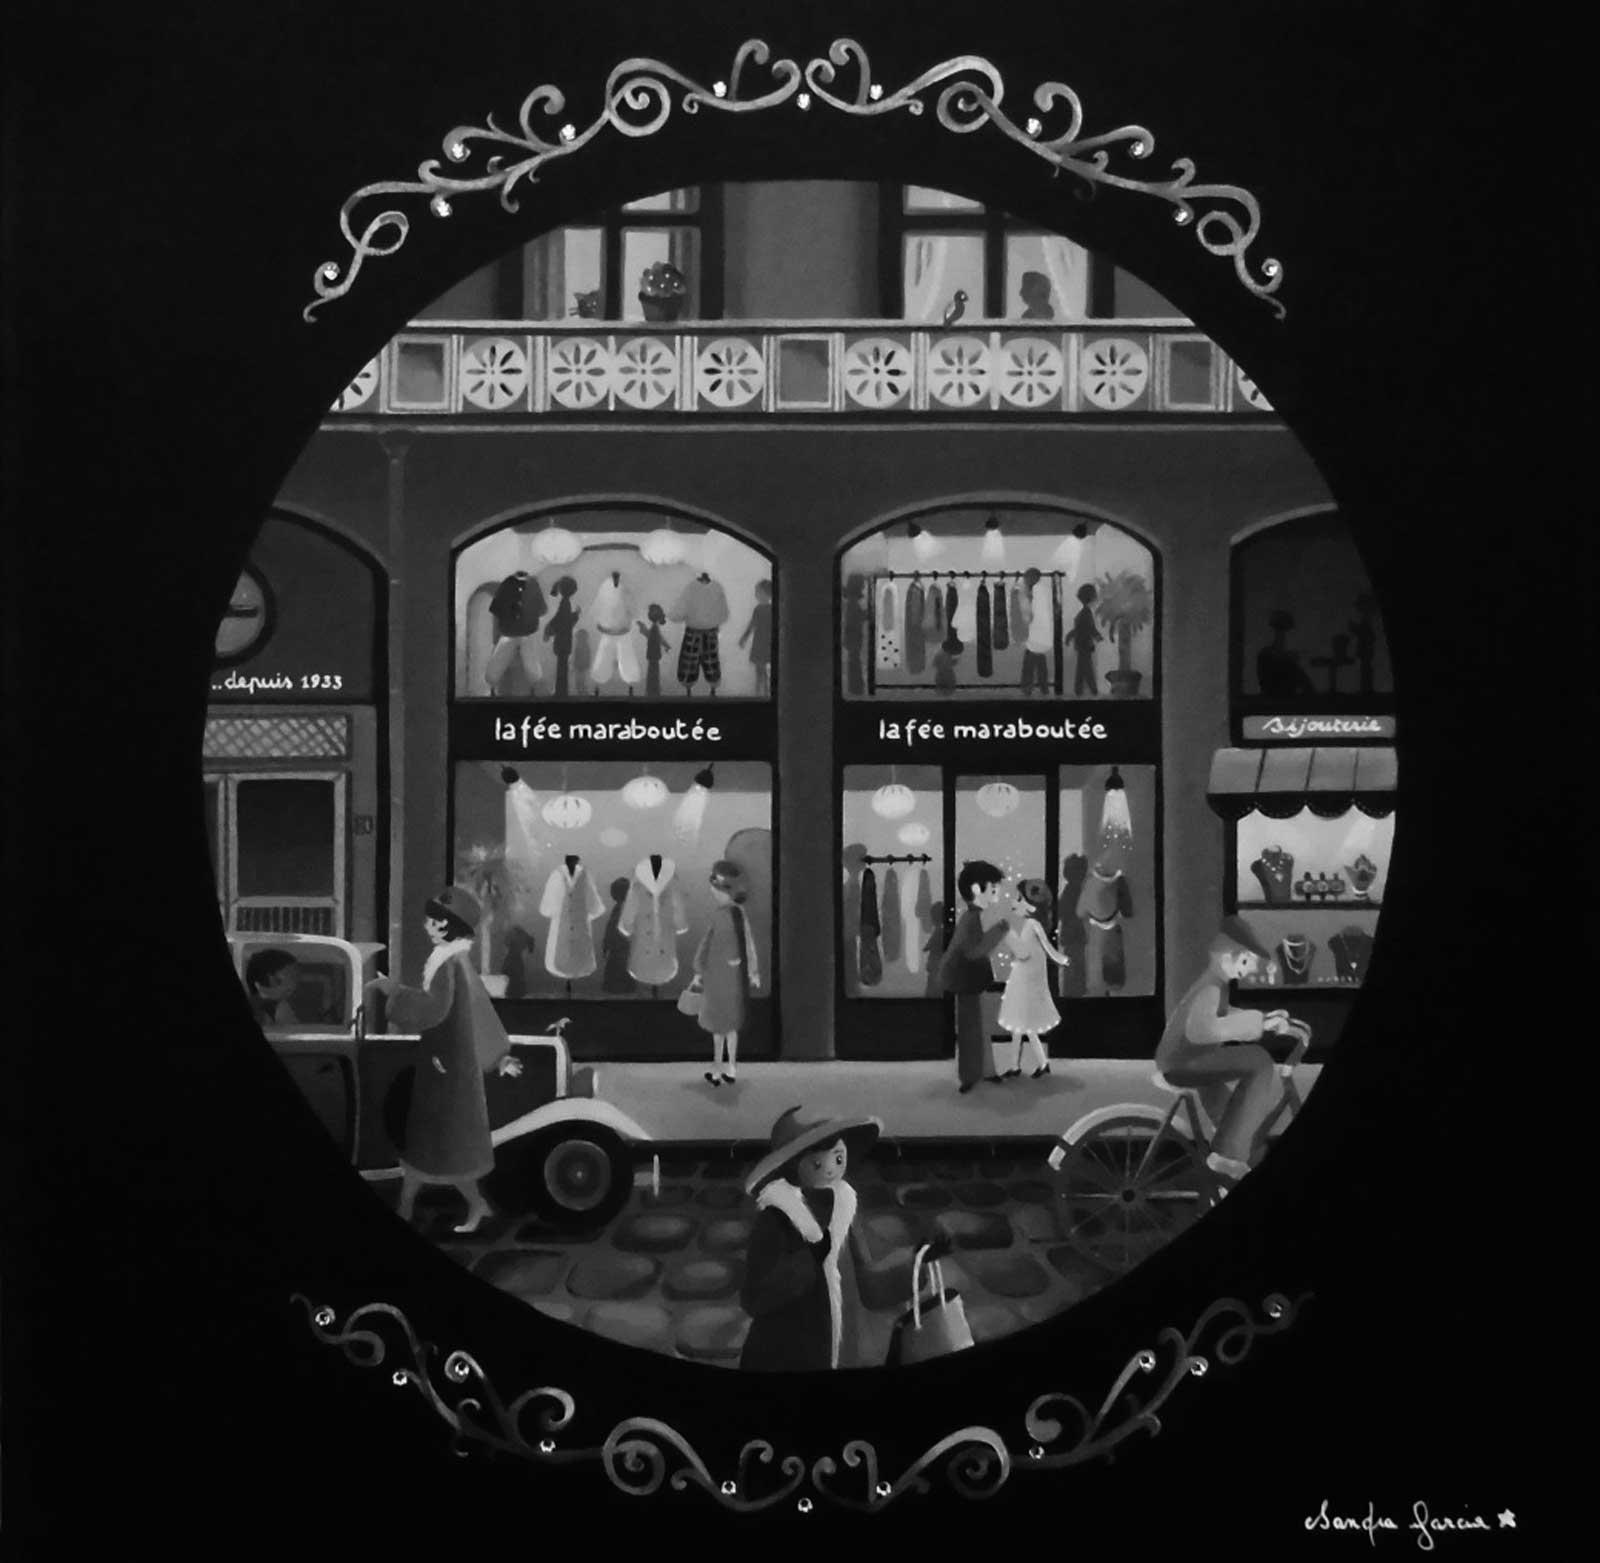 Peinture acrylique sur châssis / made with Swarovski elements.